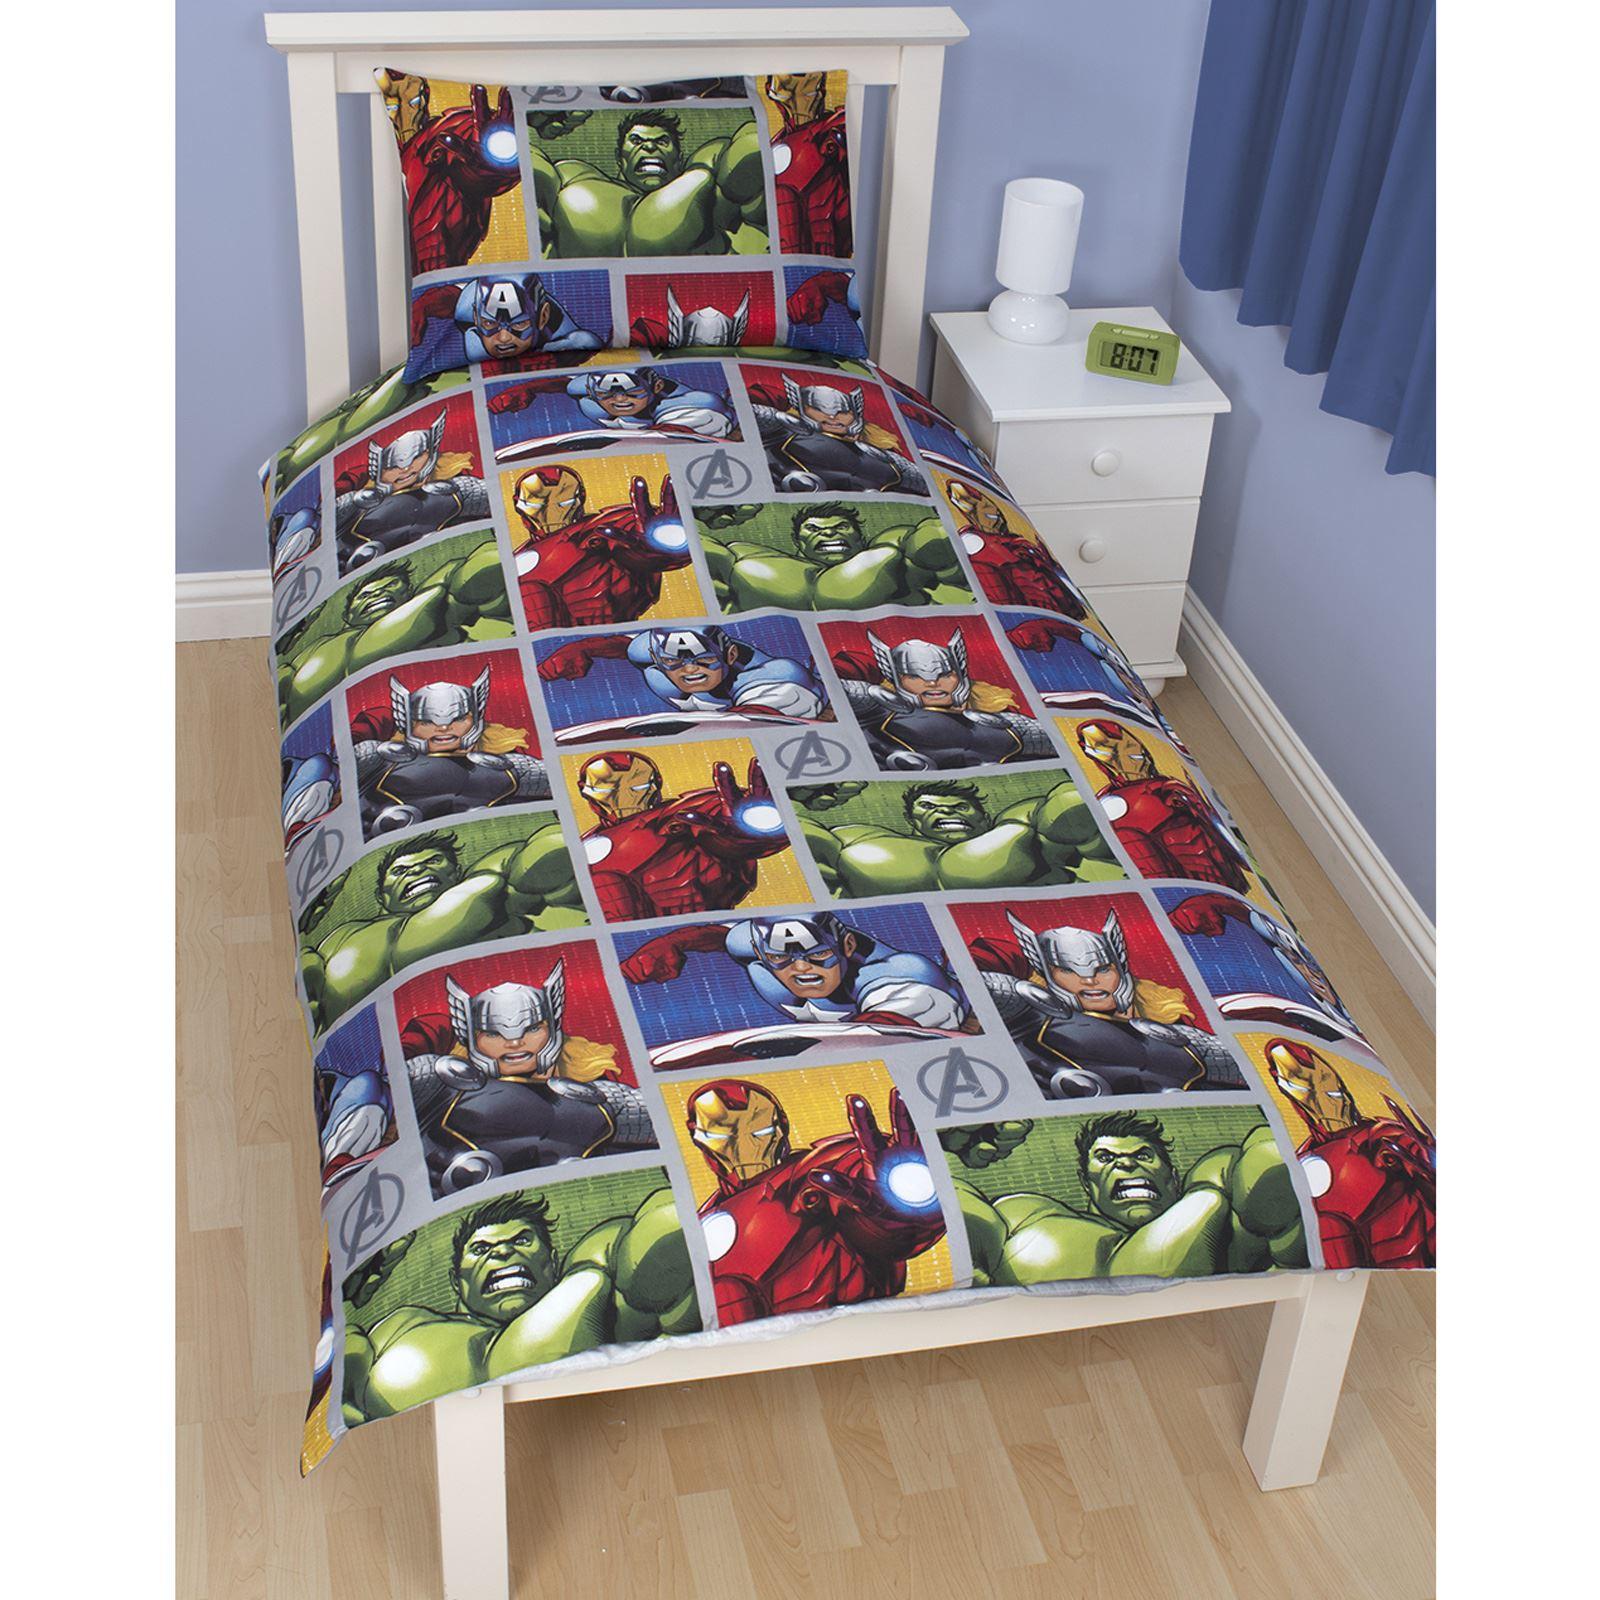 OFFICIAL AVENGERS MARVEL COMICS BEDDING + BEDROOM ACCESSORIES ... : avengers quilt cover australia - Adamdwight.com